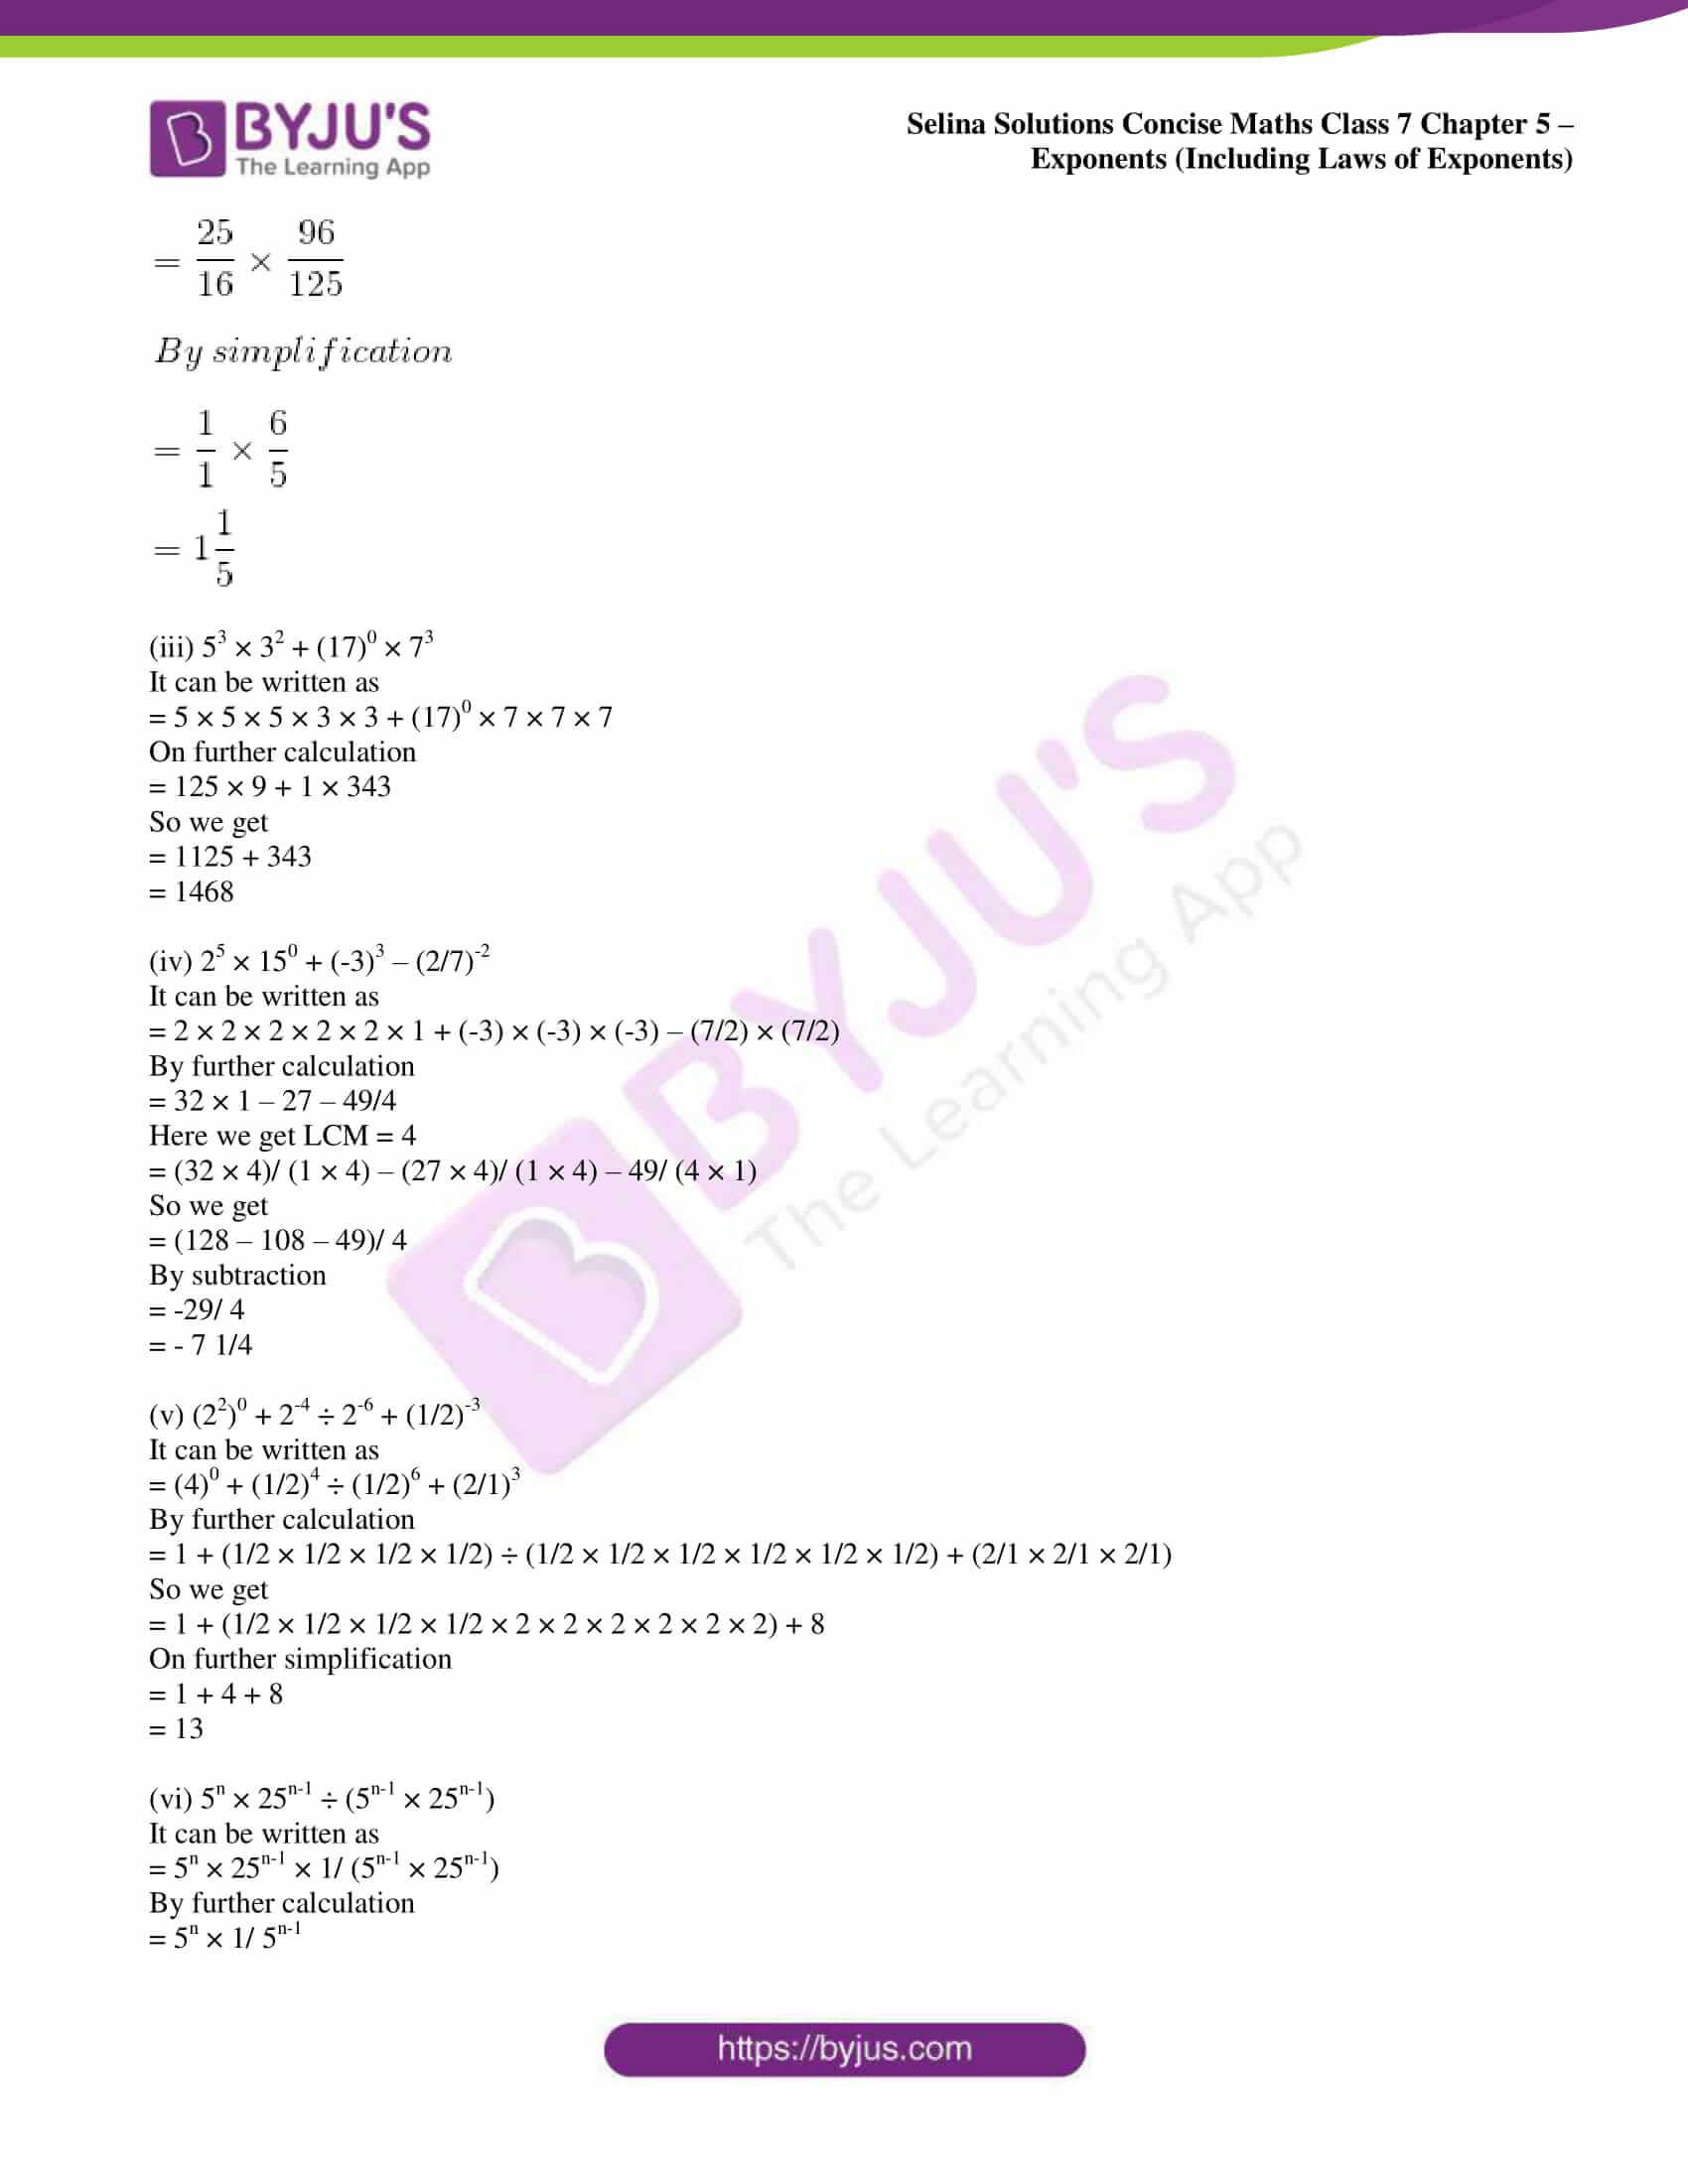 selina sol concise maths class 7 ch5 ex 5b 13